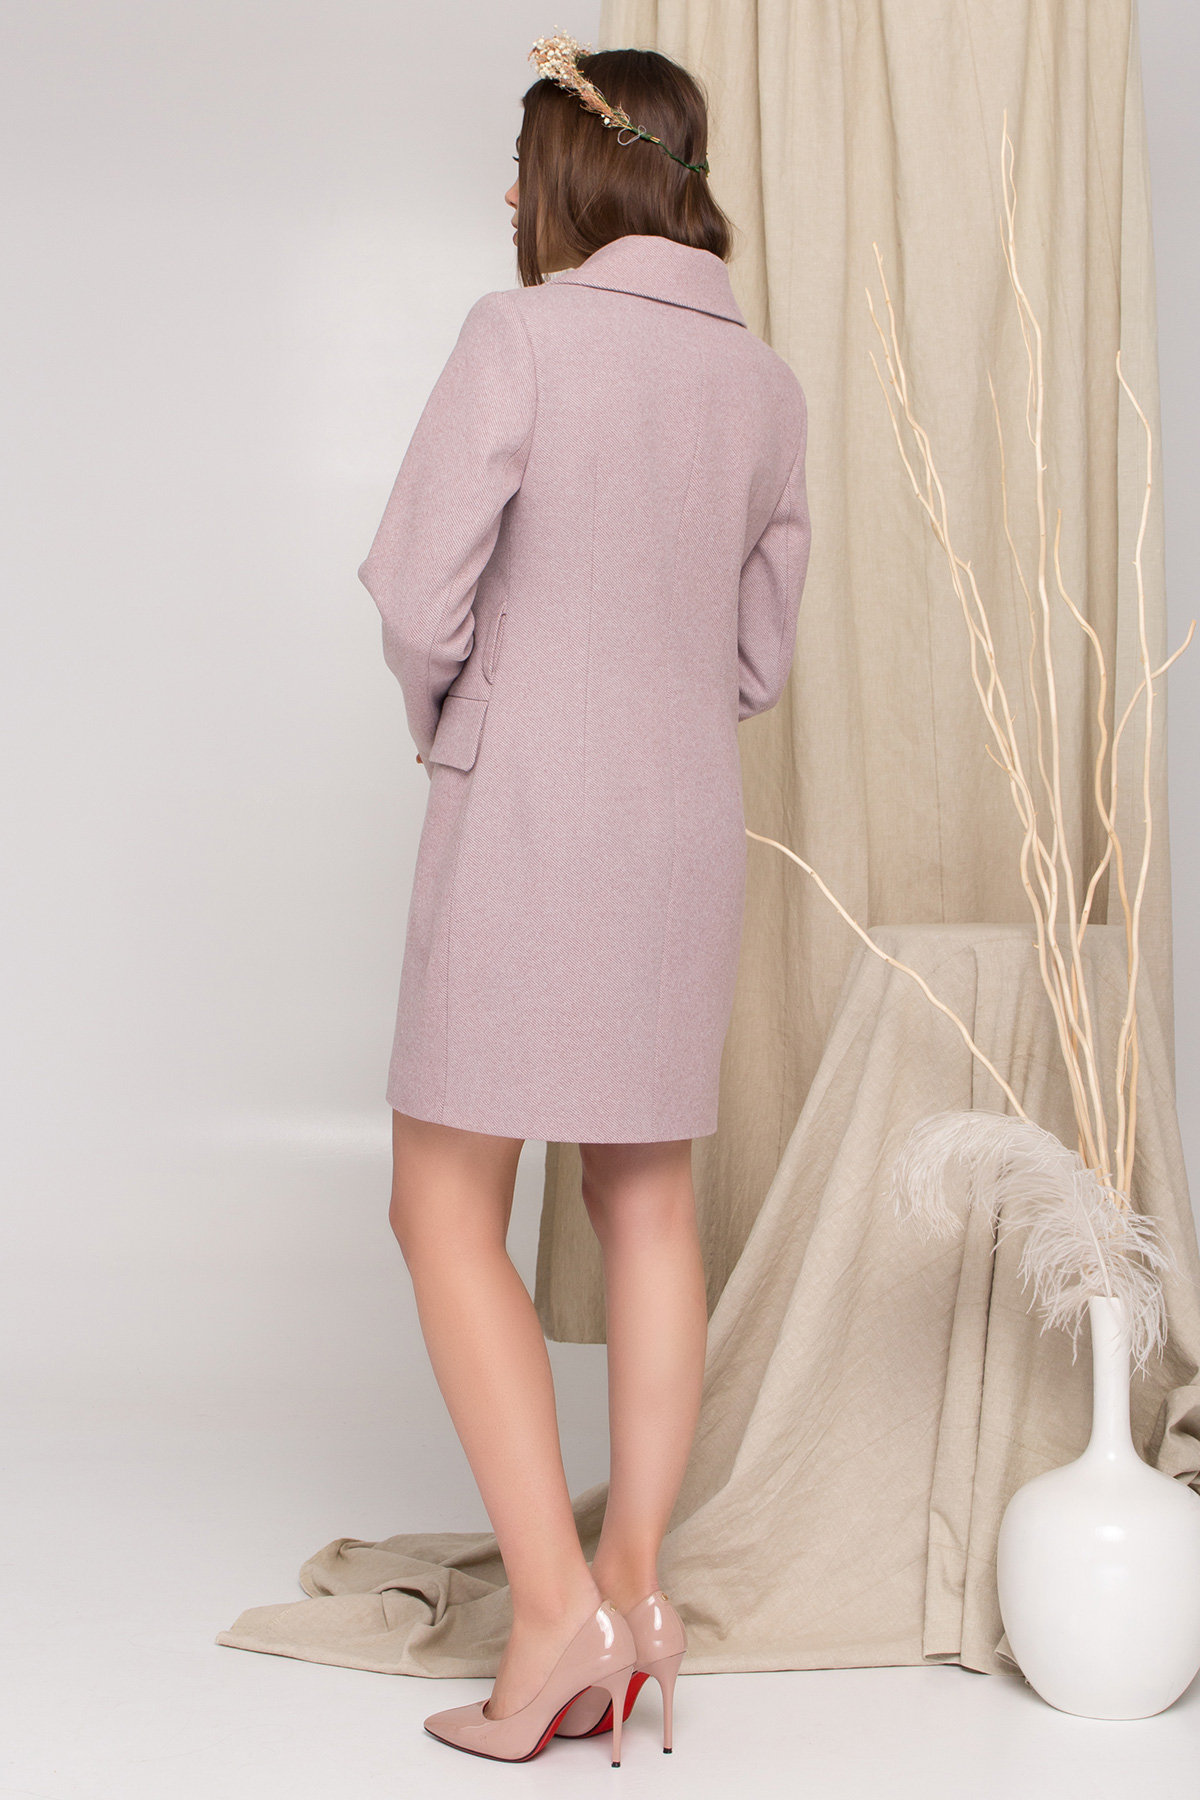 Пальто Корси 8943 АРТ. 45241 Цвет: Пудра 90 - фото 4, интернет магазин tm-modus.ru